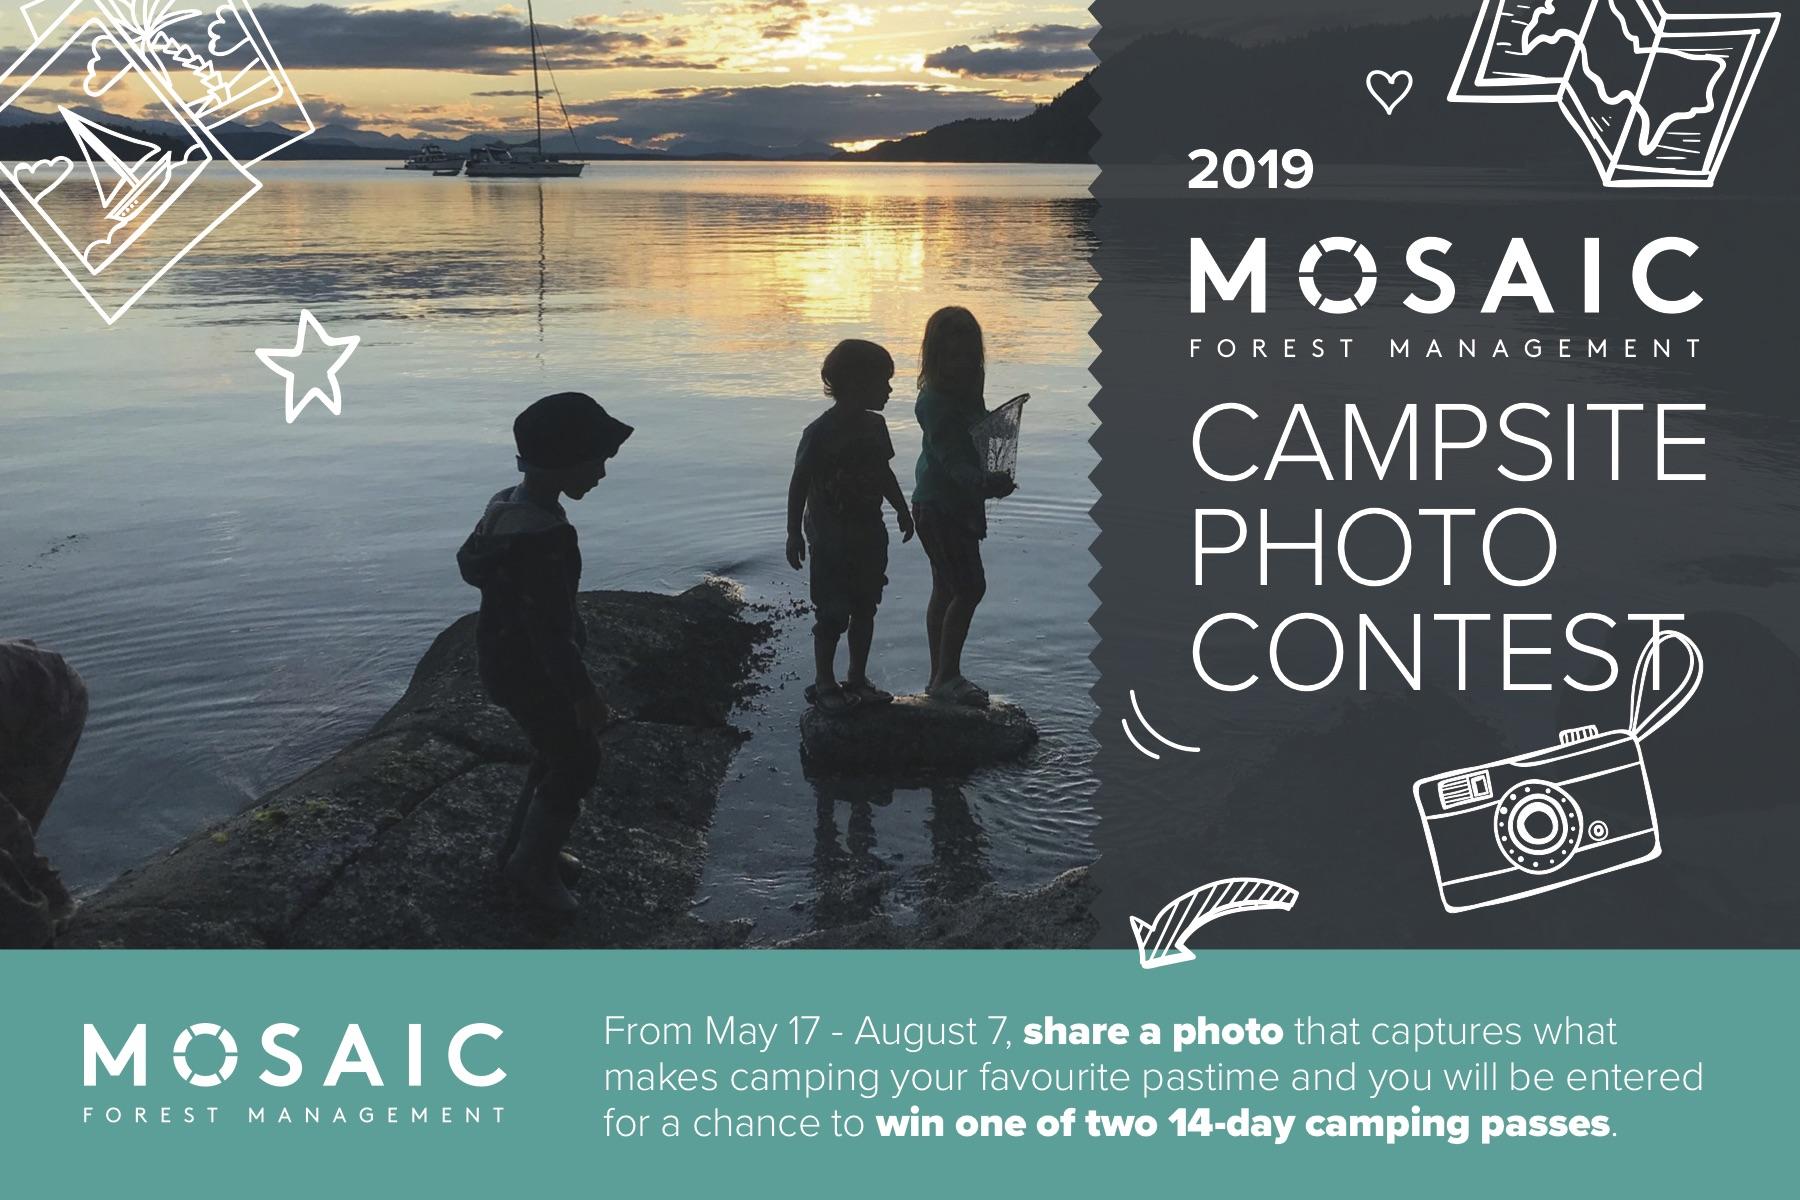 mosaic_postcard_contest_V3.jpg